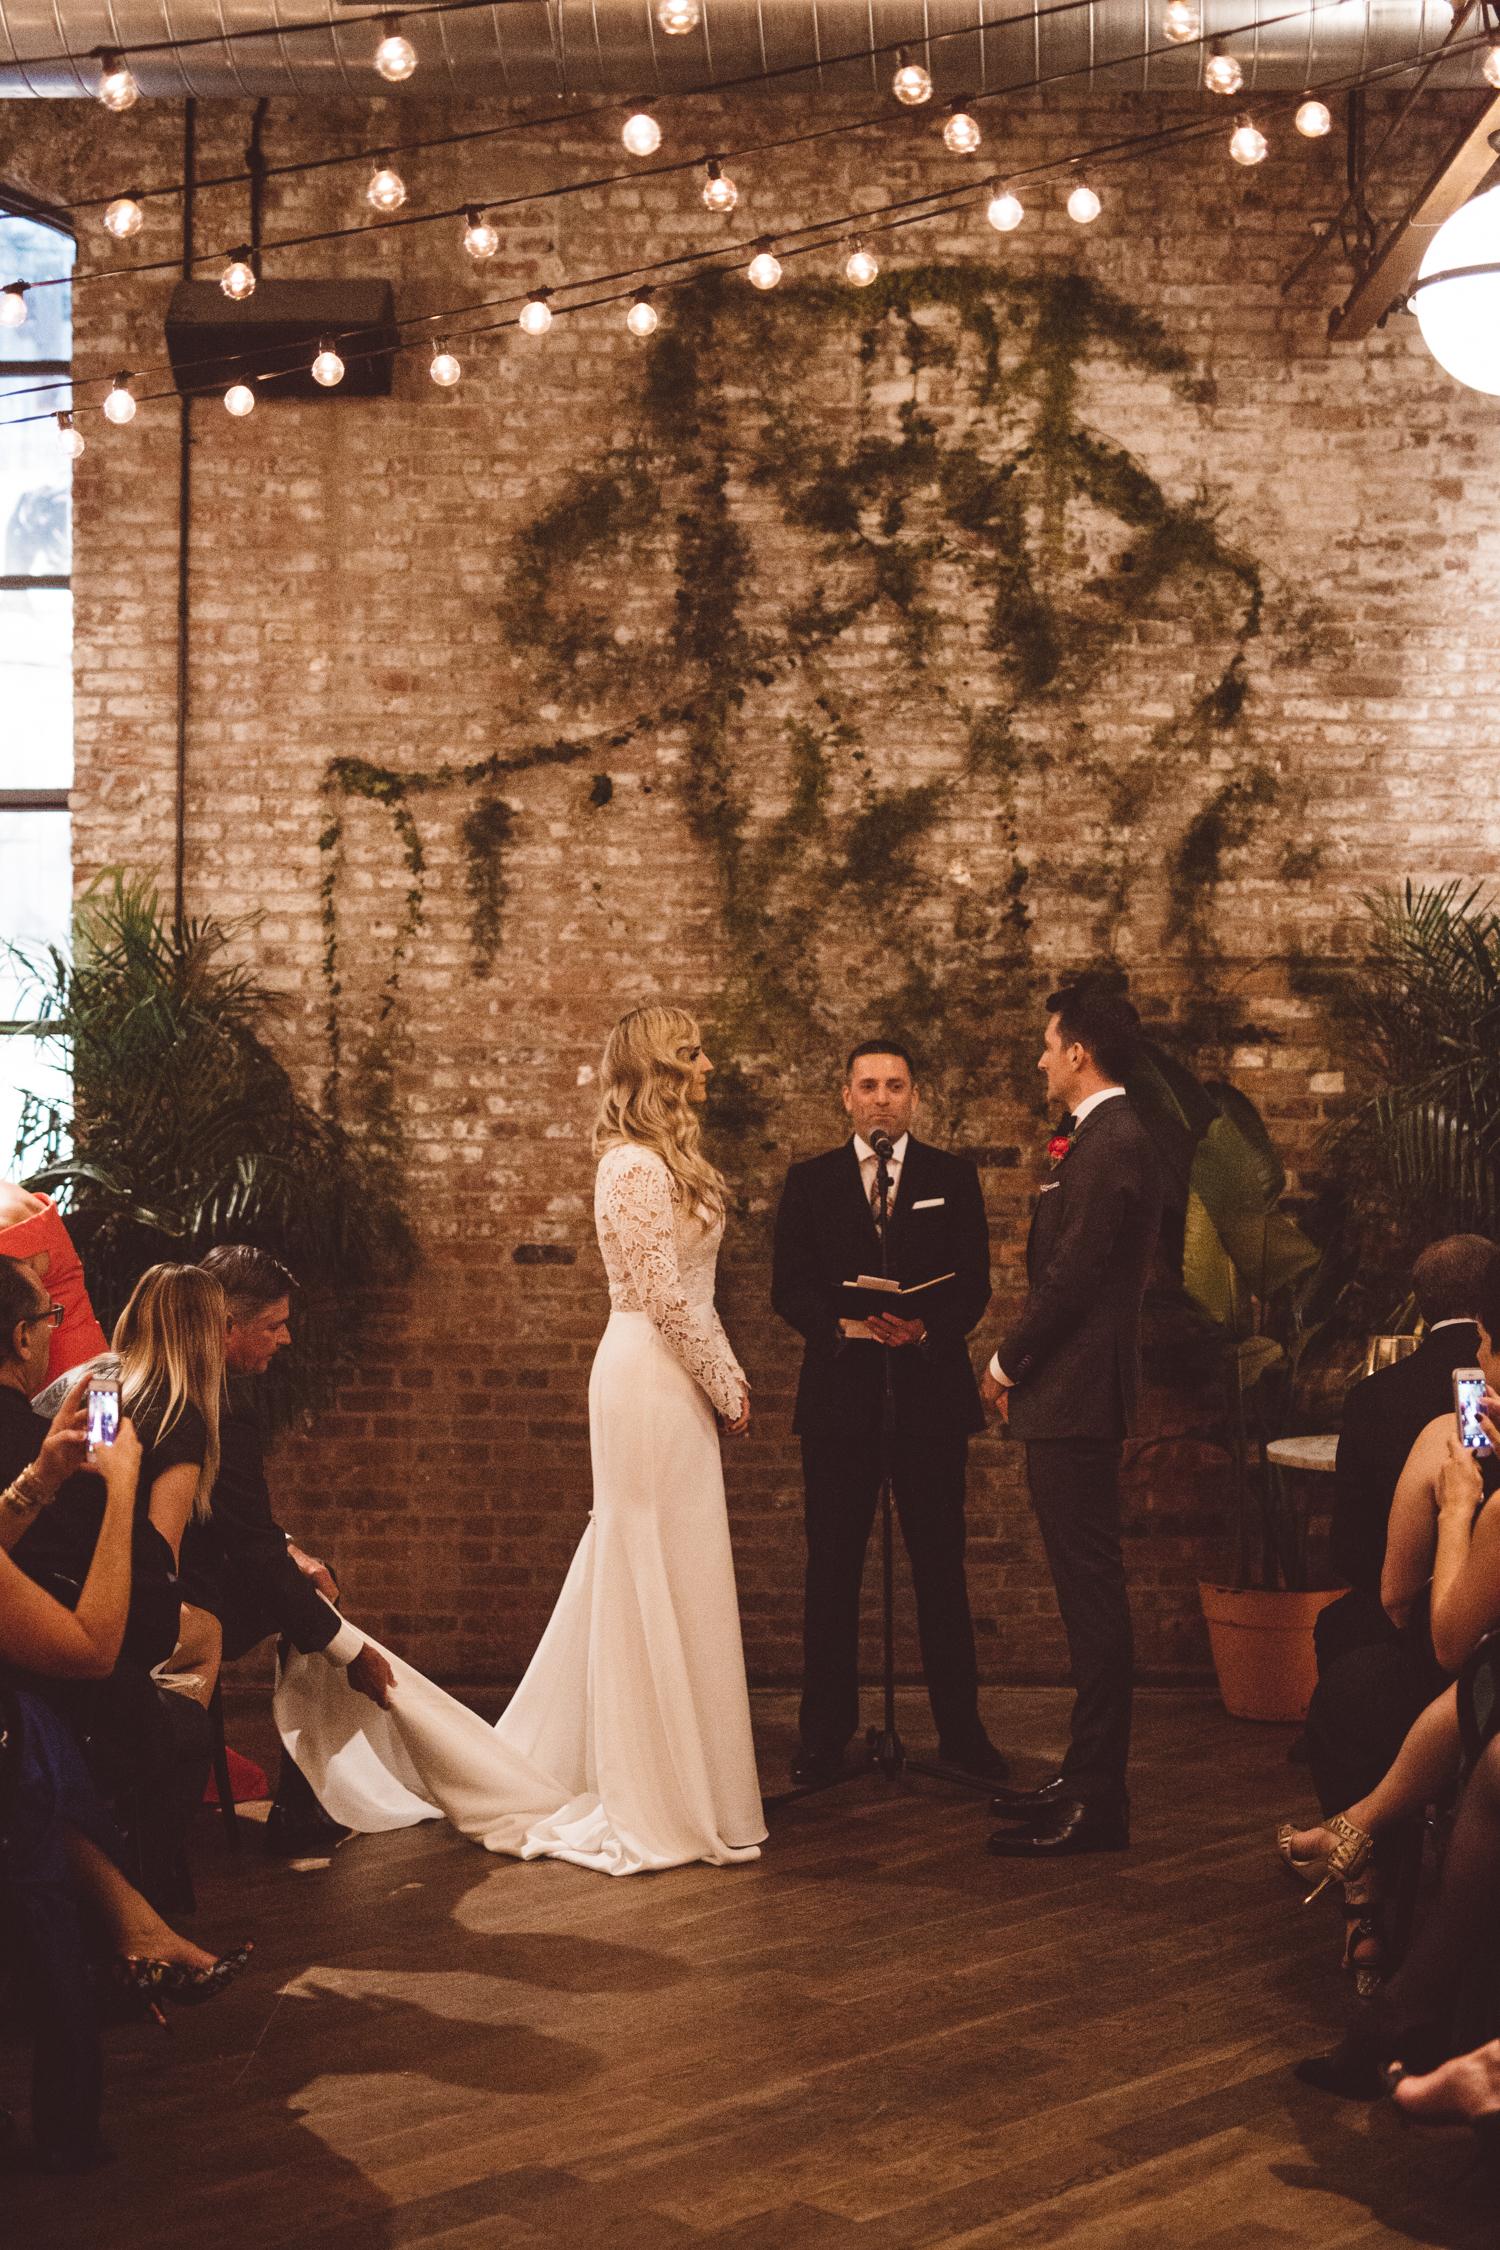 KDP_Andrea&Mike_wedding-476.jpg